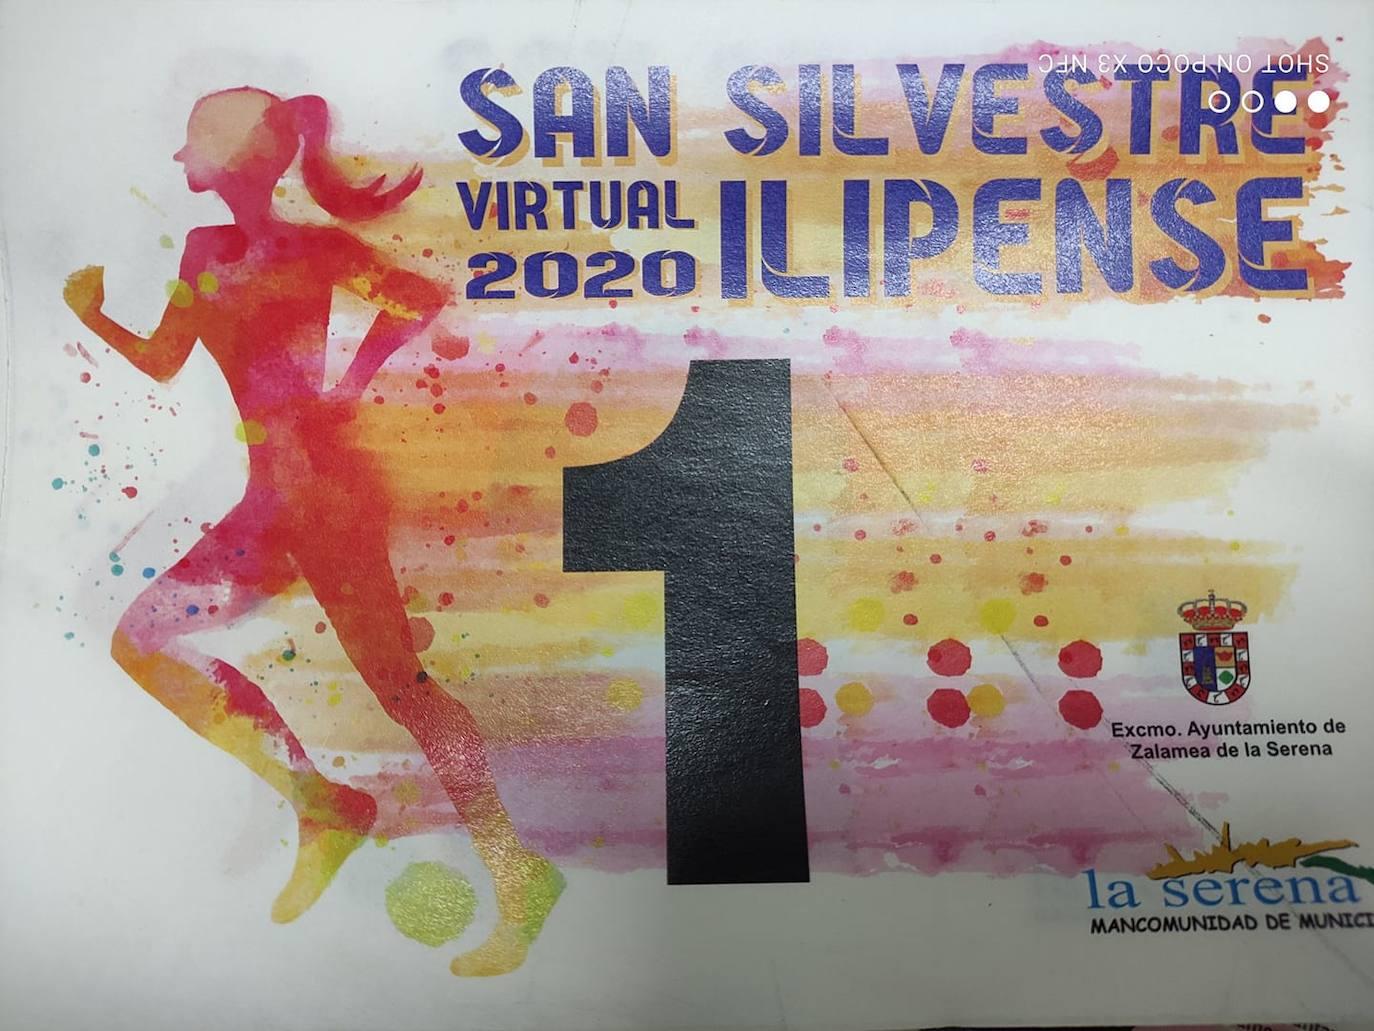 La 'San Silvestre Ilipense' no faltó a la cita, pero tuvo que ser de forma virtual